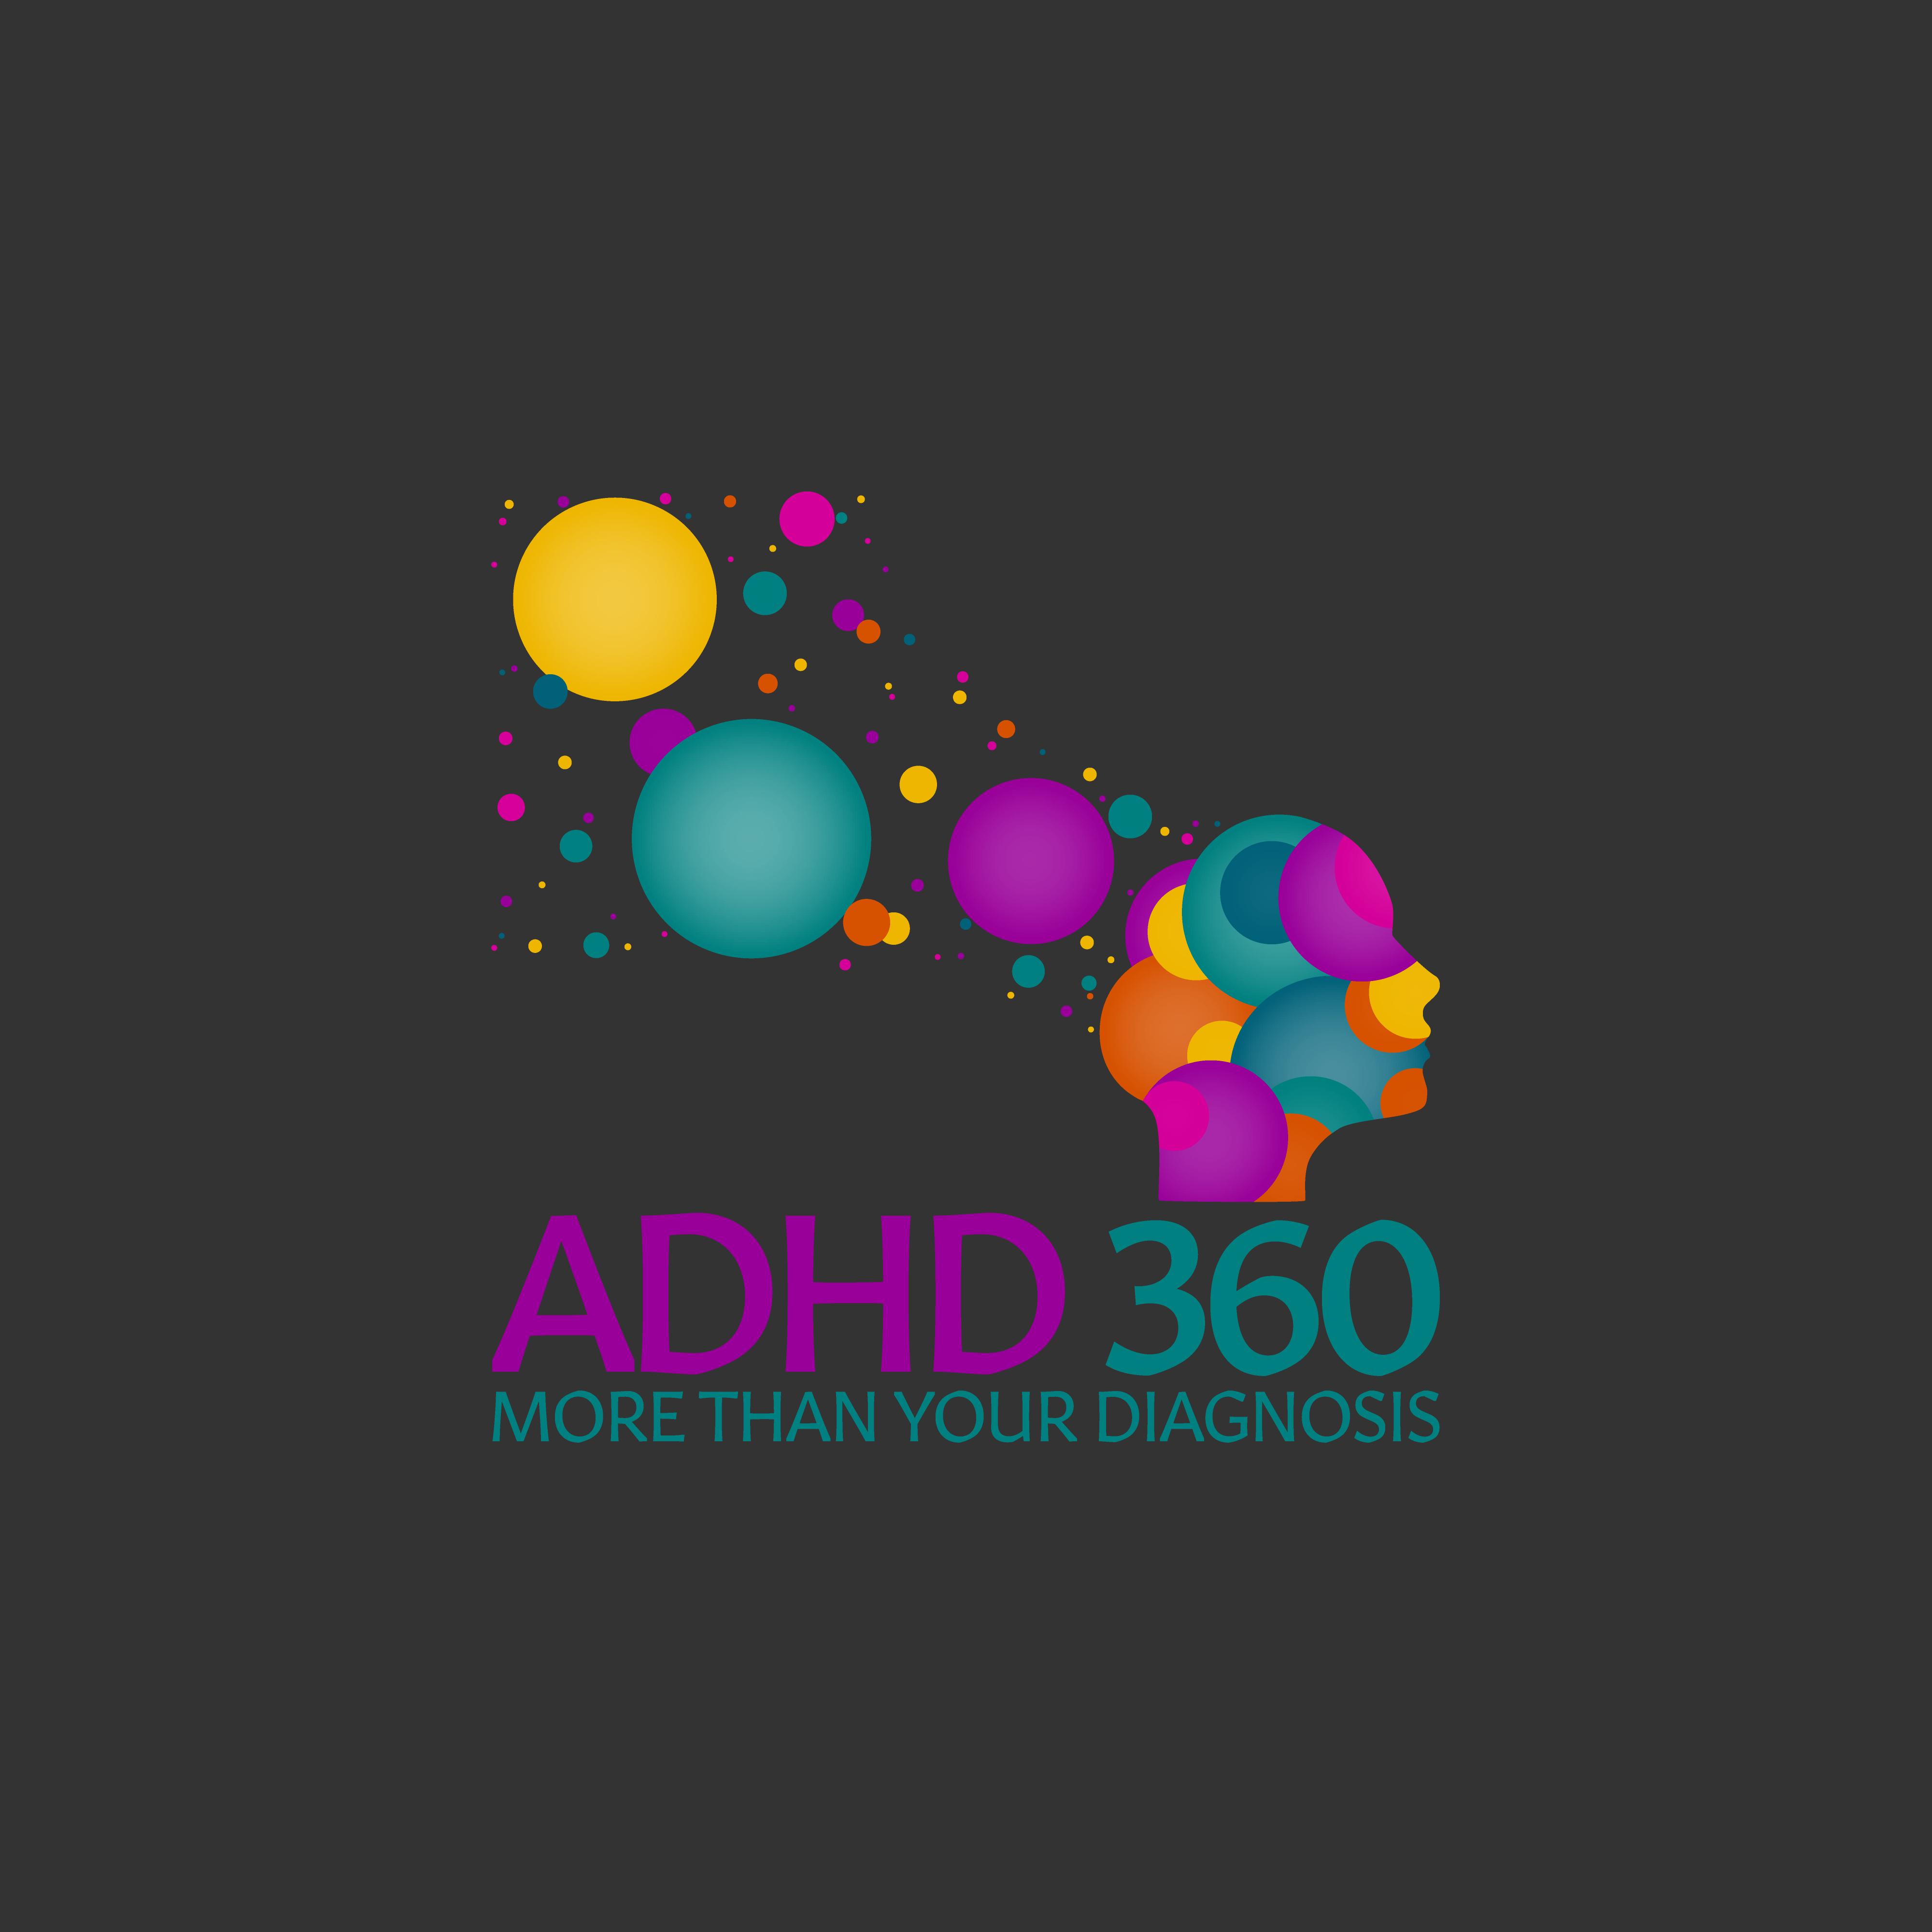 ADHD-360-logo-001